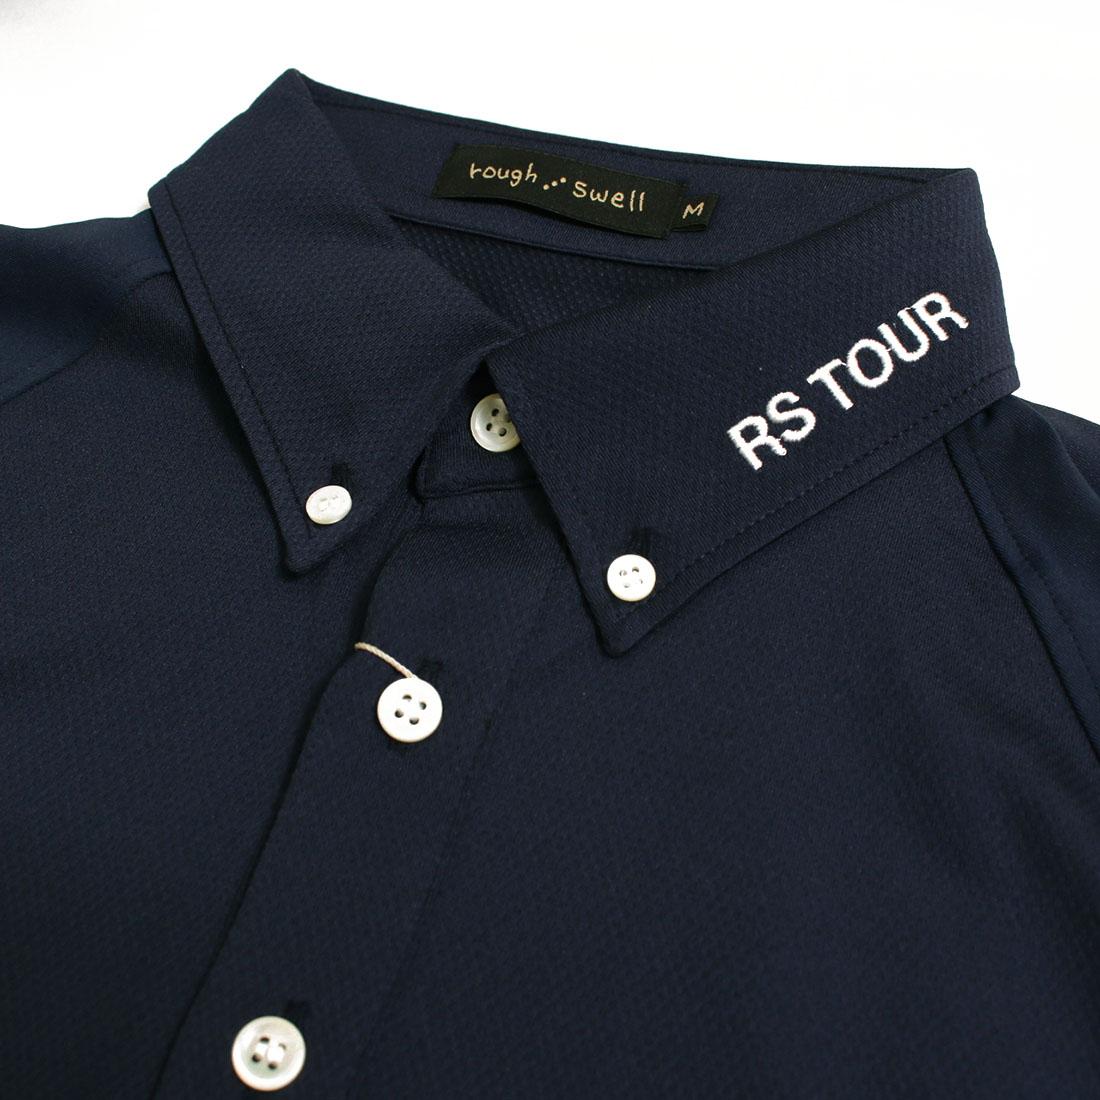 rough&swell ラフ&スウェル 【送料無料】○新作○FLAG TOUR POLO(M L XL)半袖ポロシャツ メール便不可